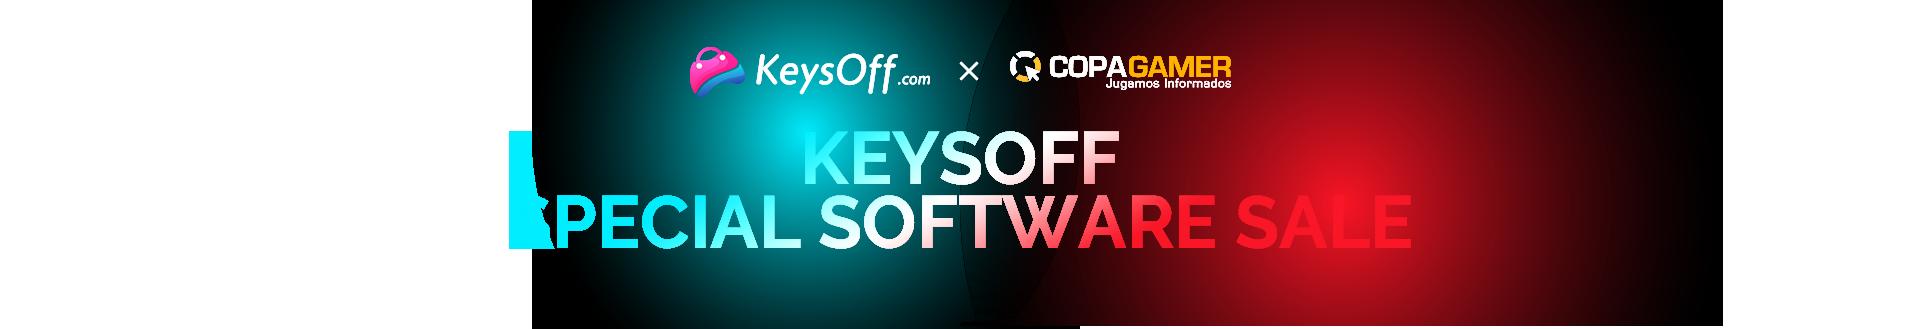 Buy Windows 10 Professional Key